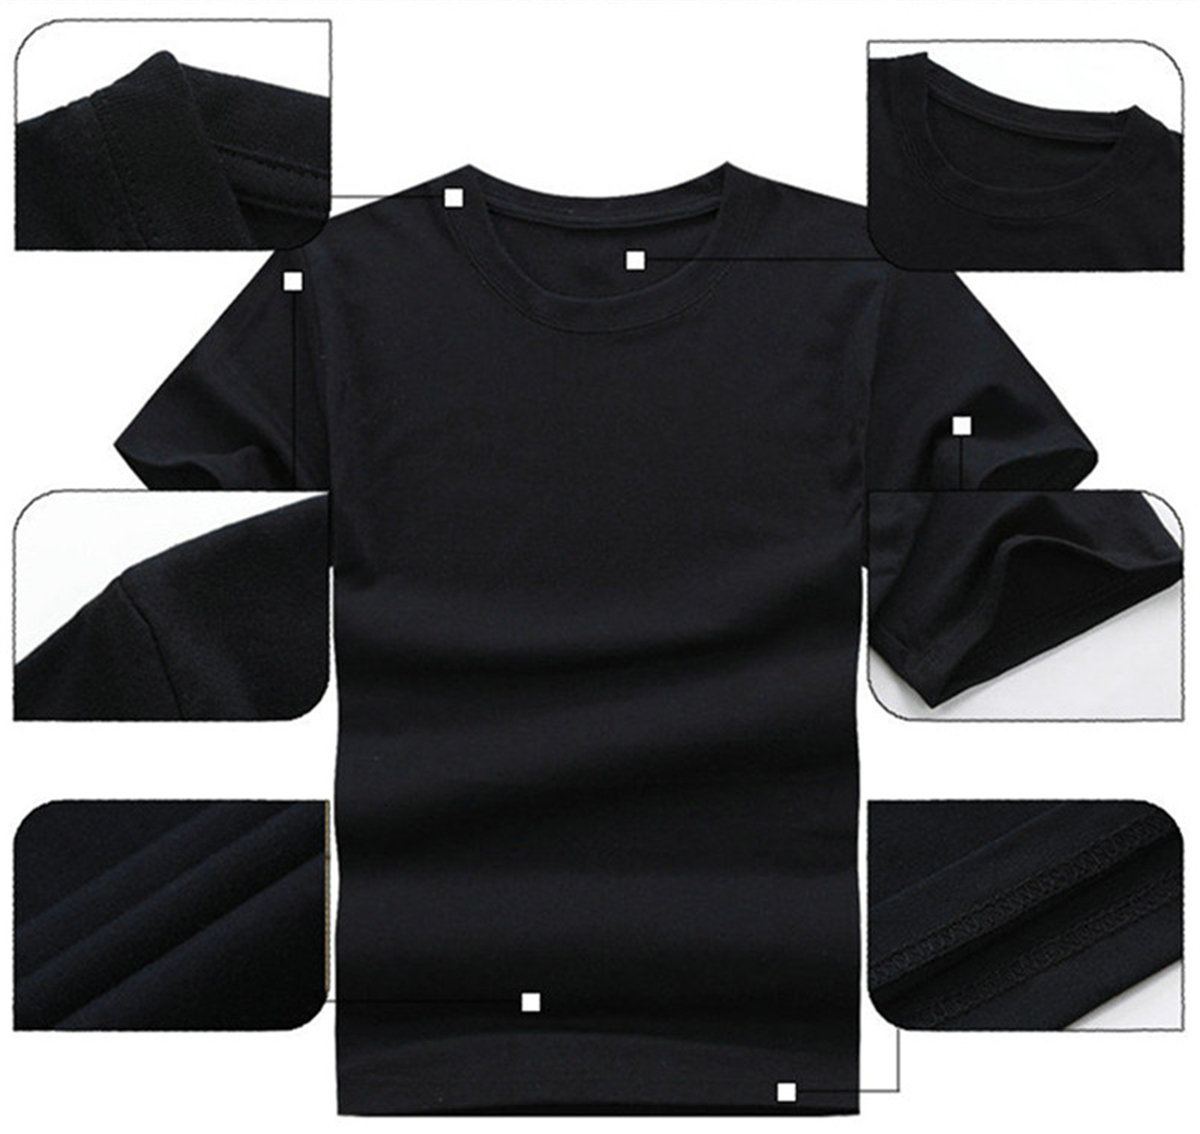 GILDAN Dont Make Me Use My Voice Human Resource Gift T-Shirt Womens T-shirt